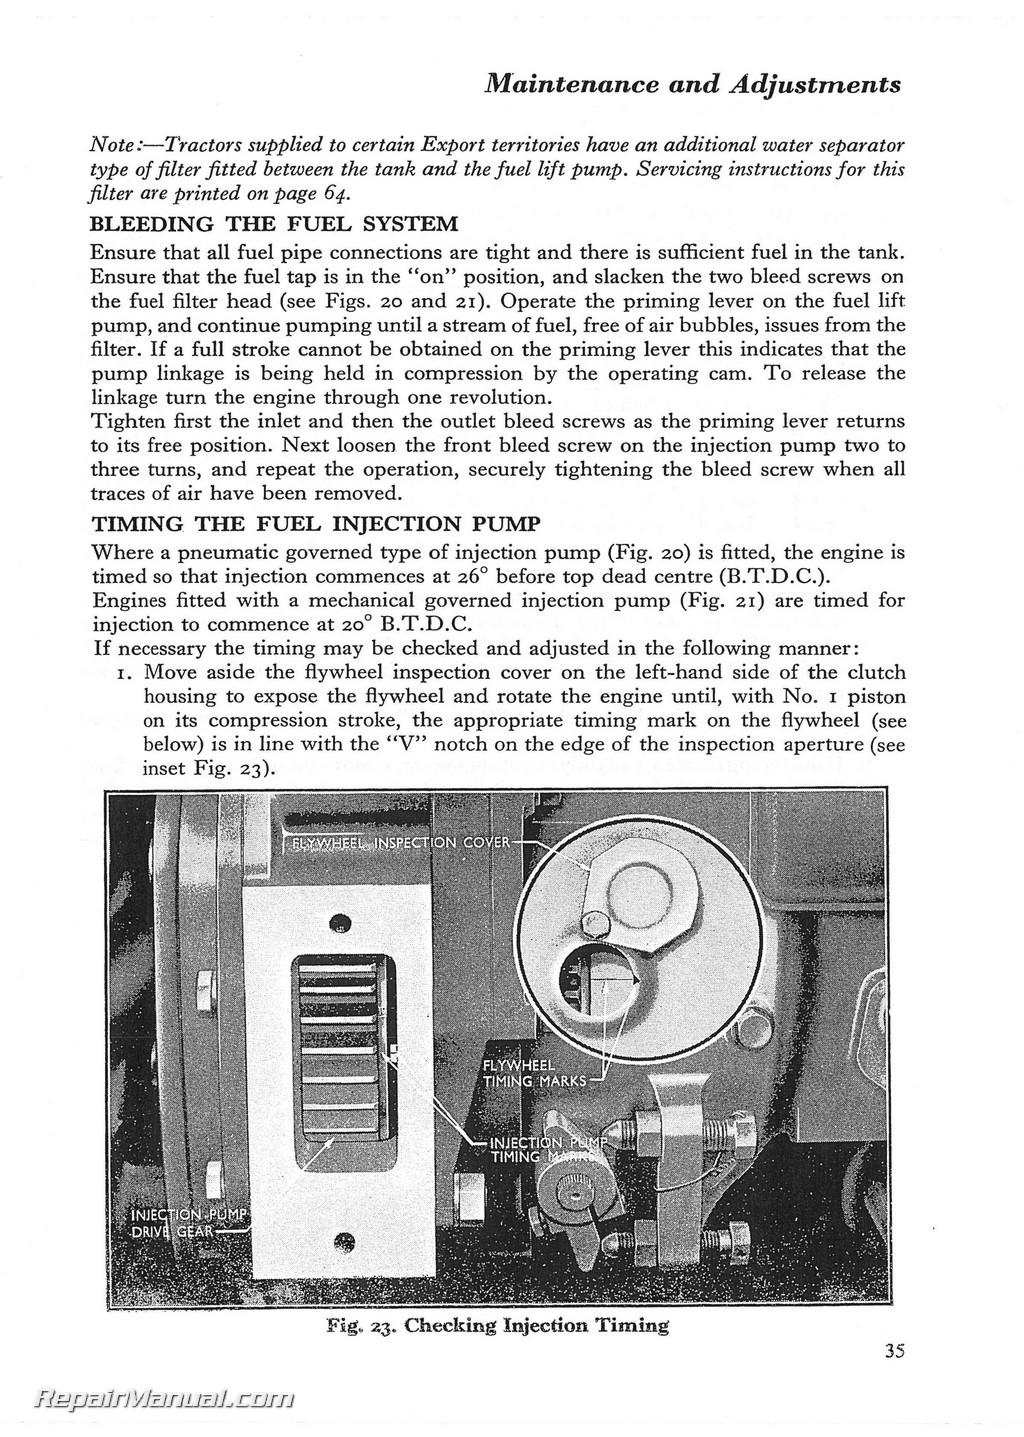 fordson dexta super dexta operators manual rh repairmanual com fordson major diesel tractor manual fordson super major tractor manual free download